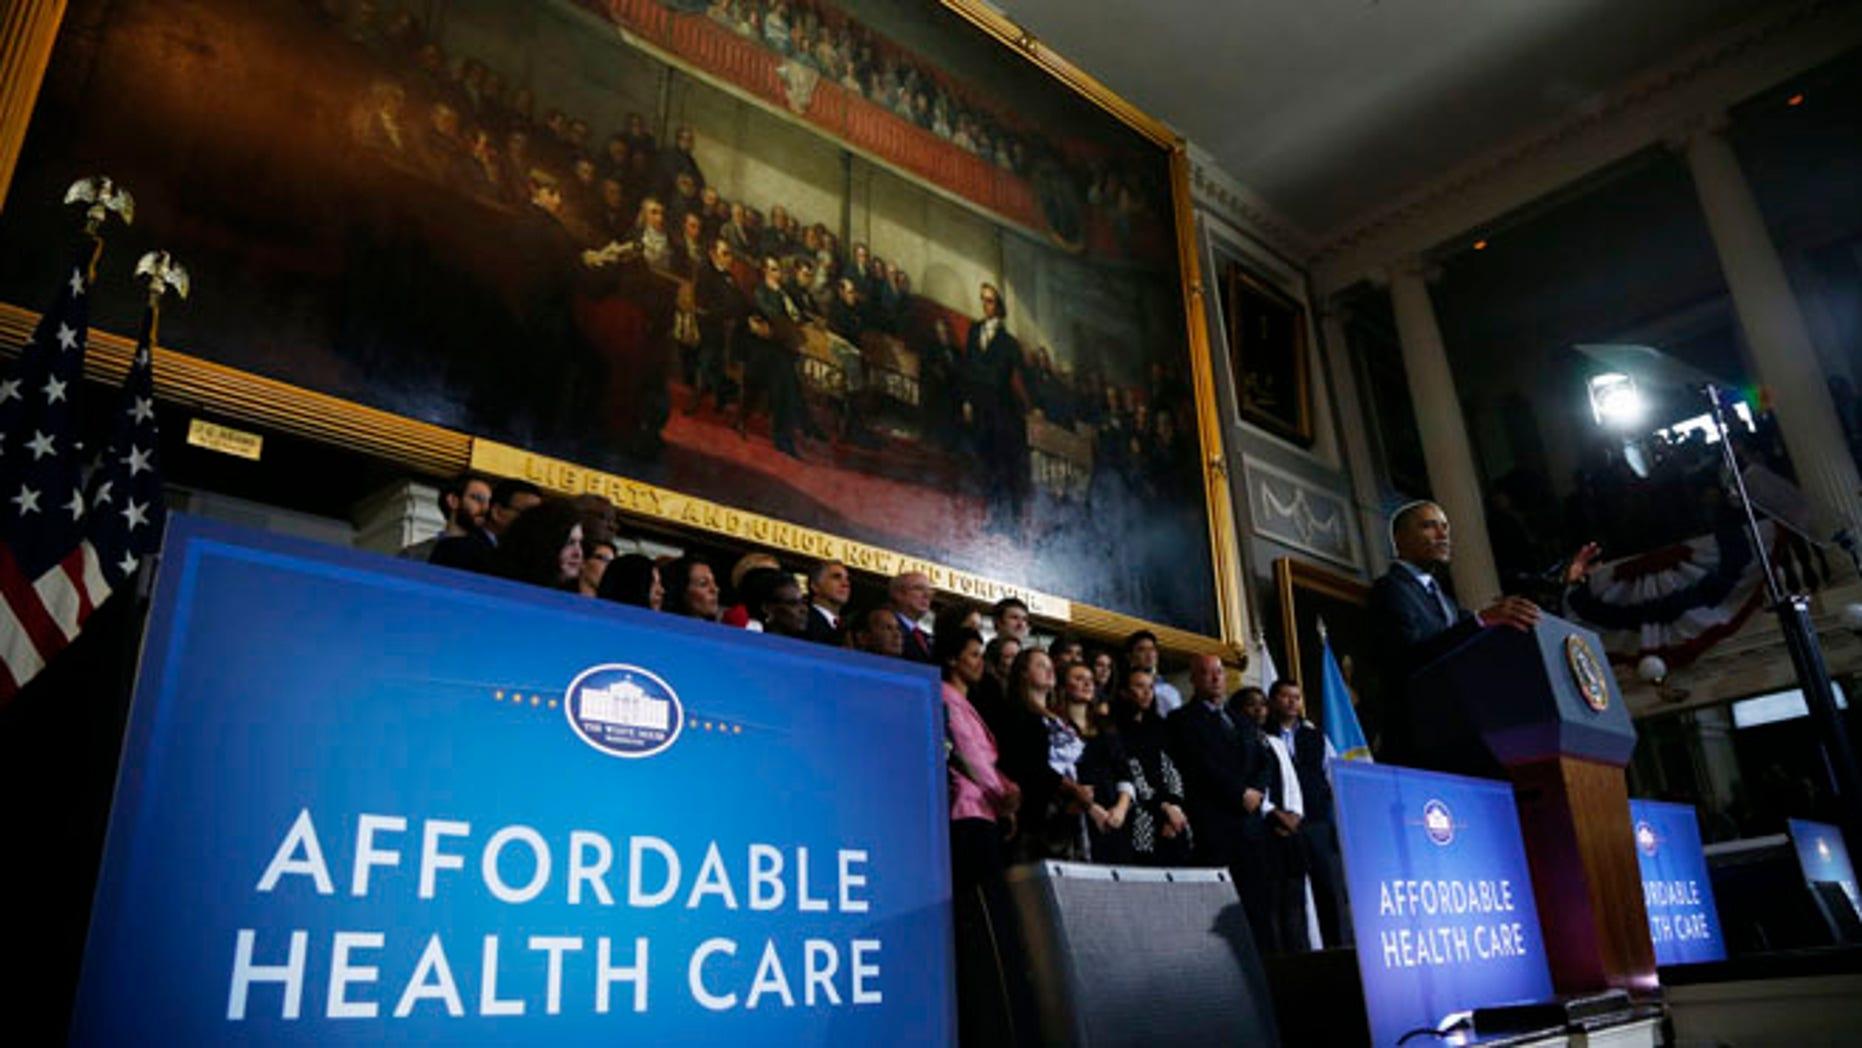 President Barack Obama speaks at Boston's historic Faneuil Hall, Wednesday, Oct. 30, 2013.